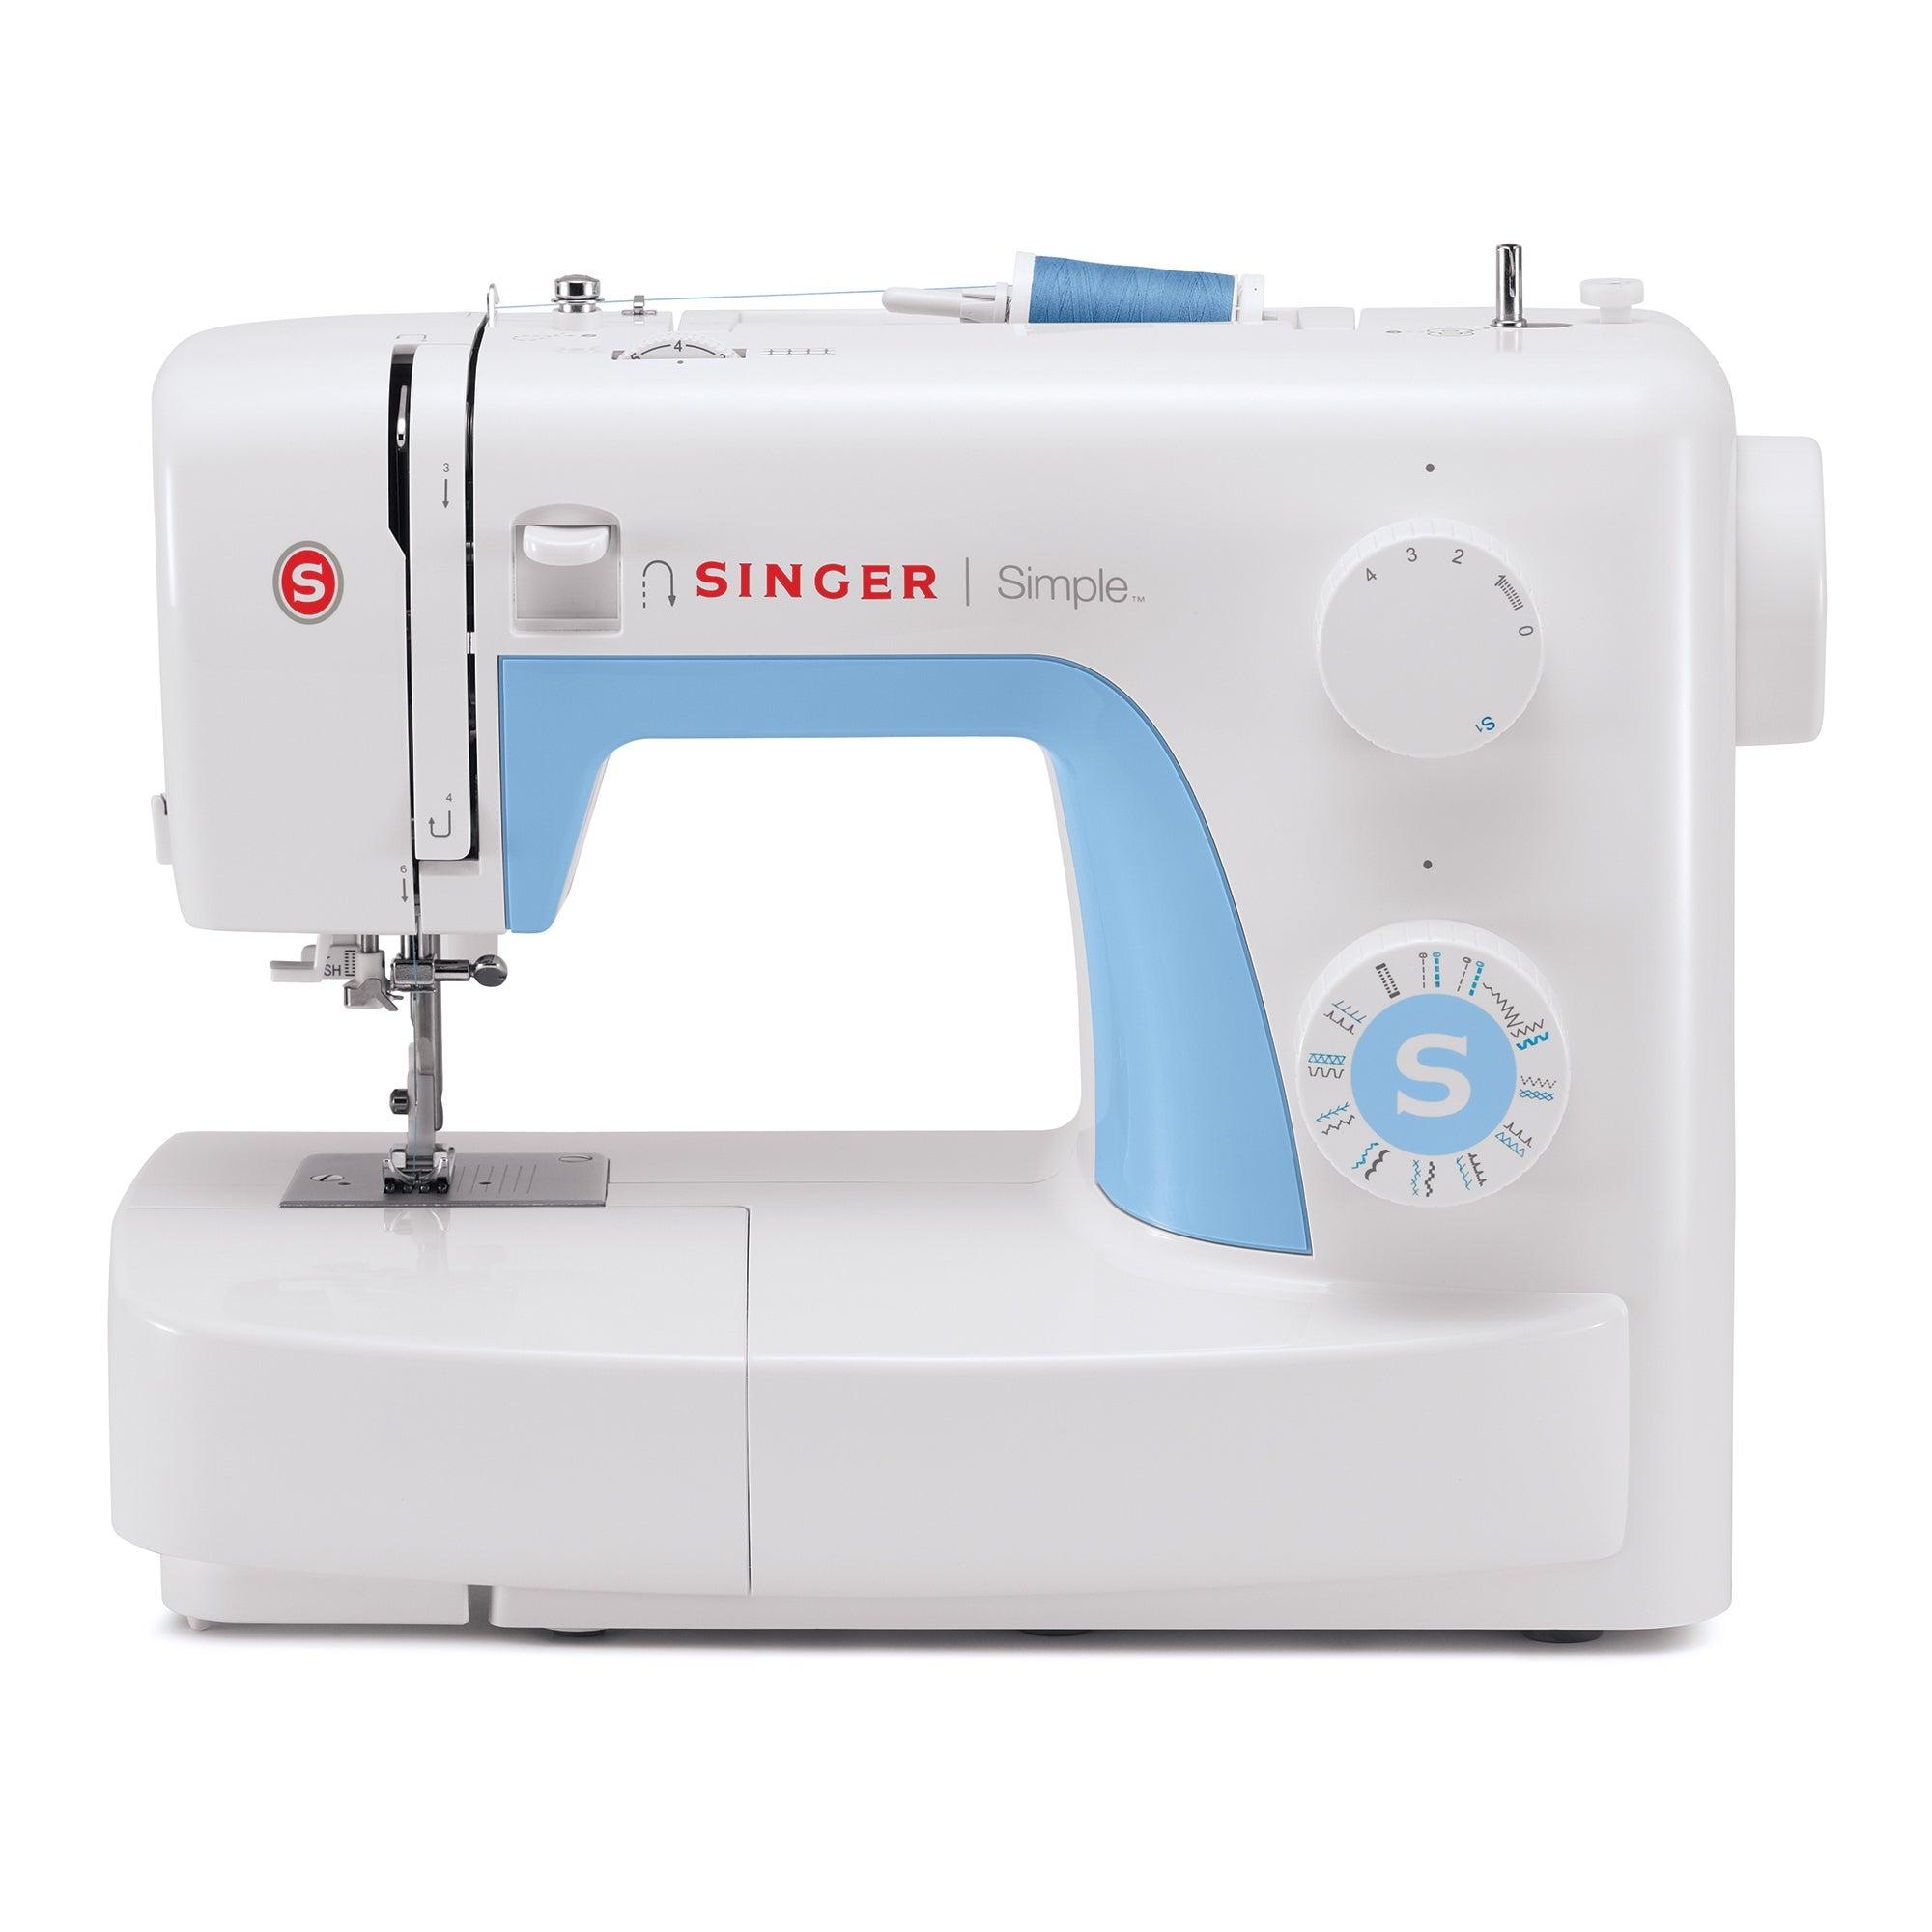 Singer 3221 Simple Sewing Machine White